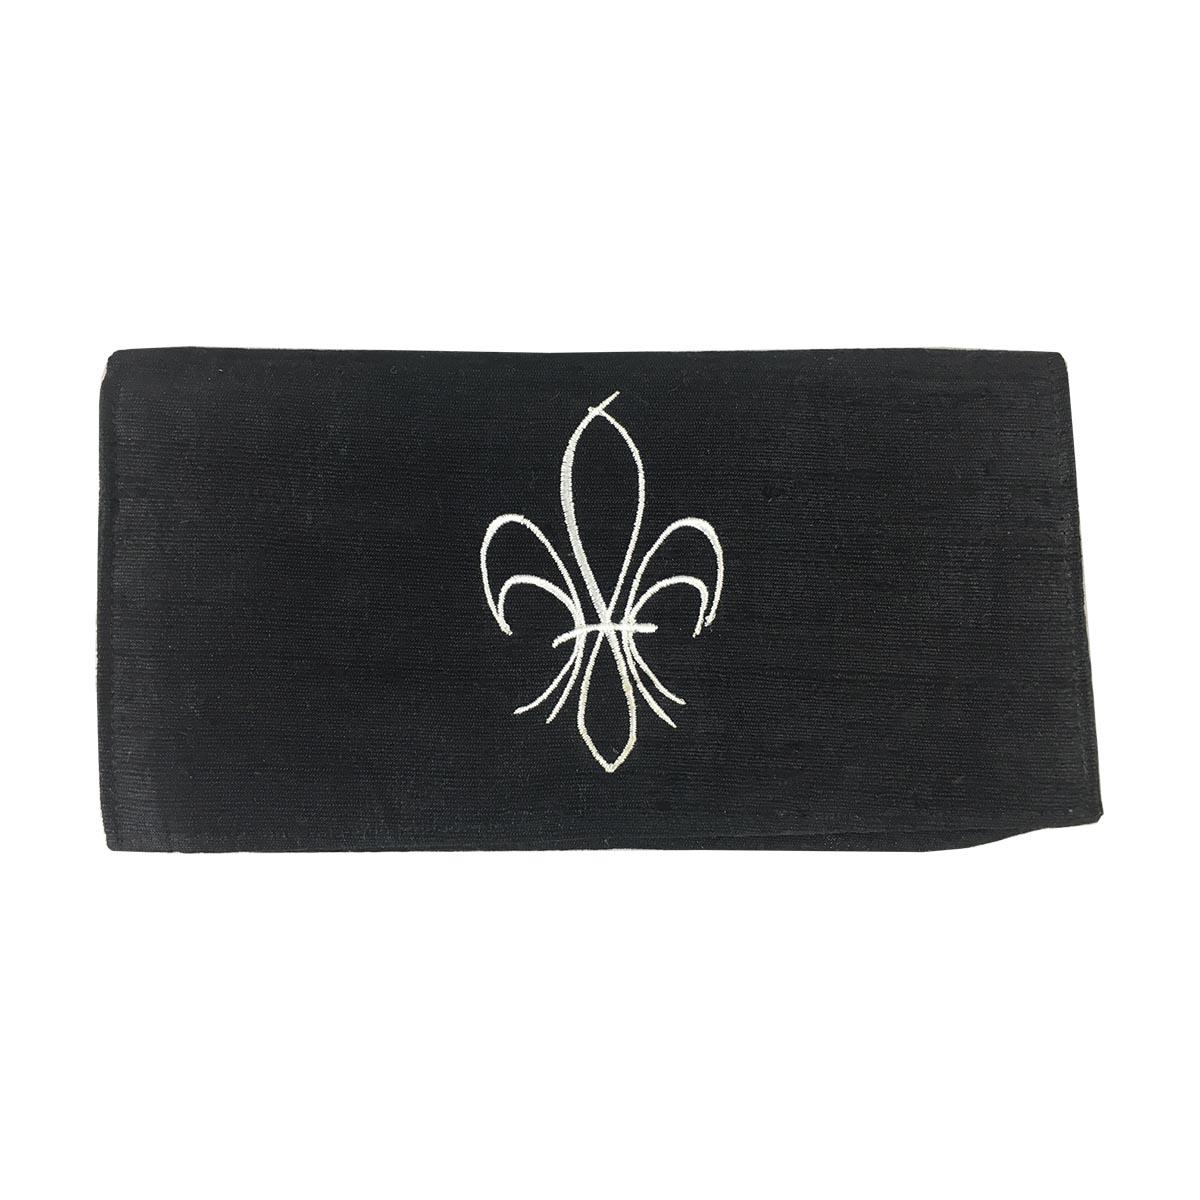 fleur de lis silk make-up pouch